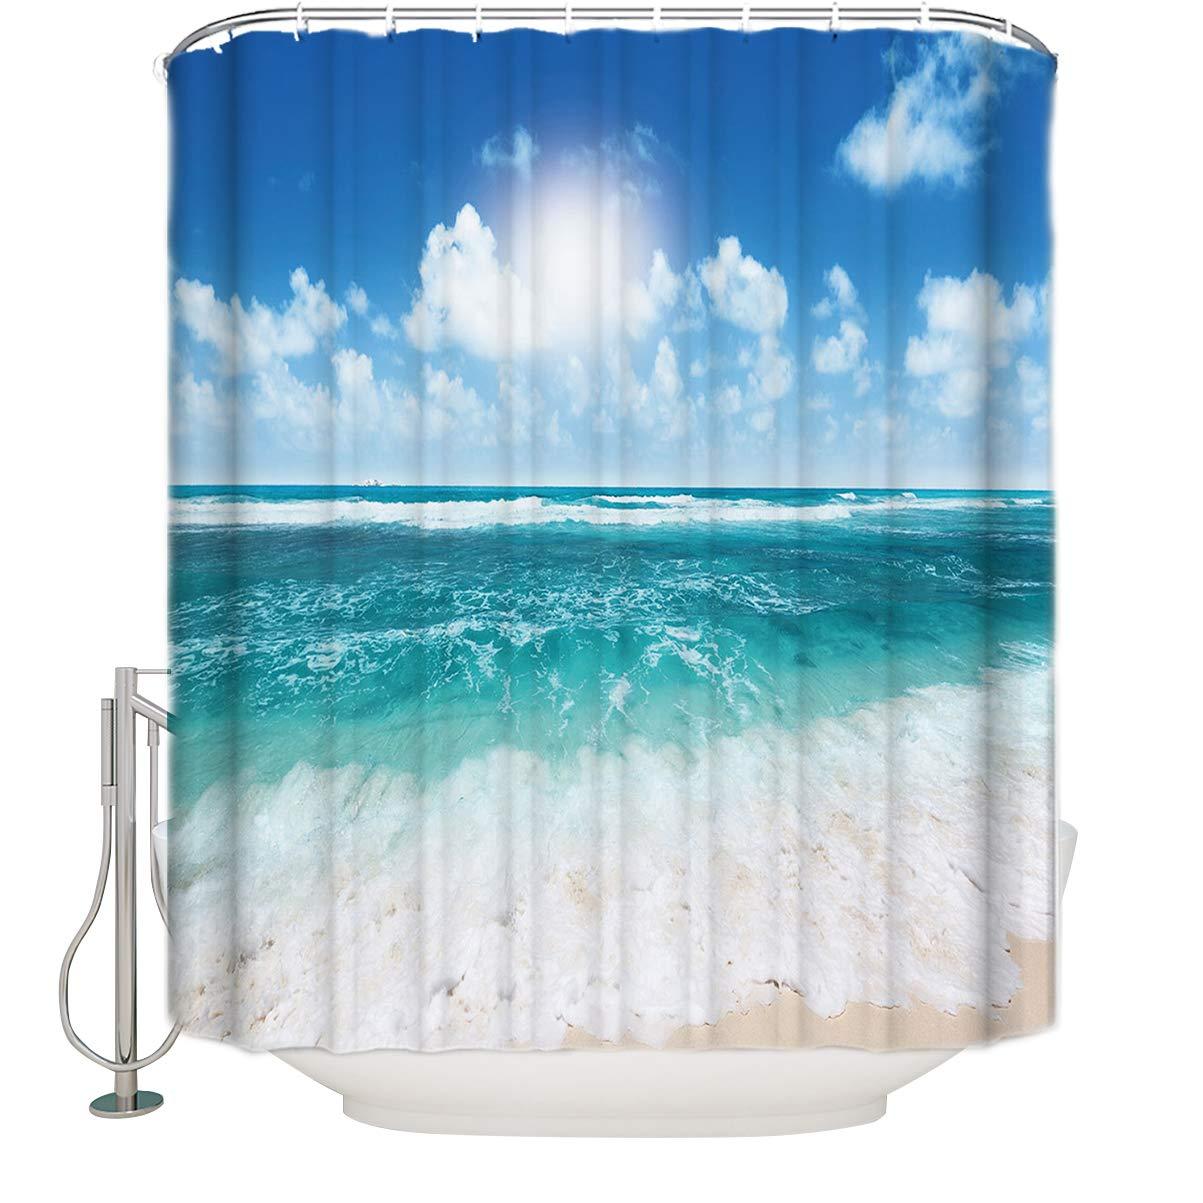 Anzonaビーチヒトデシェル防水防かびファブリック浴室シャワーカーテンフック付き 割引 36'' x 72'' スタイル6 通販 B07FFKH6CW